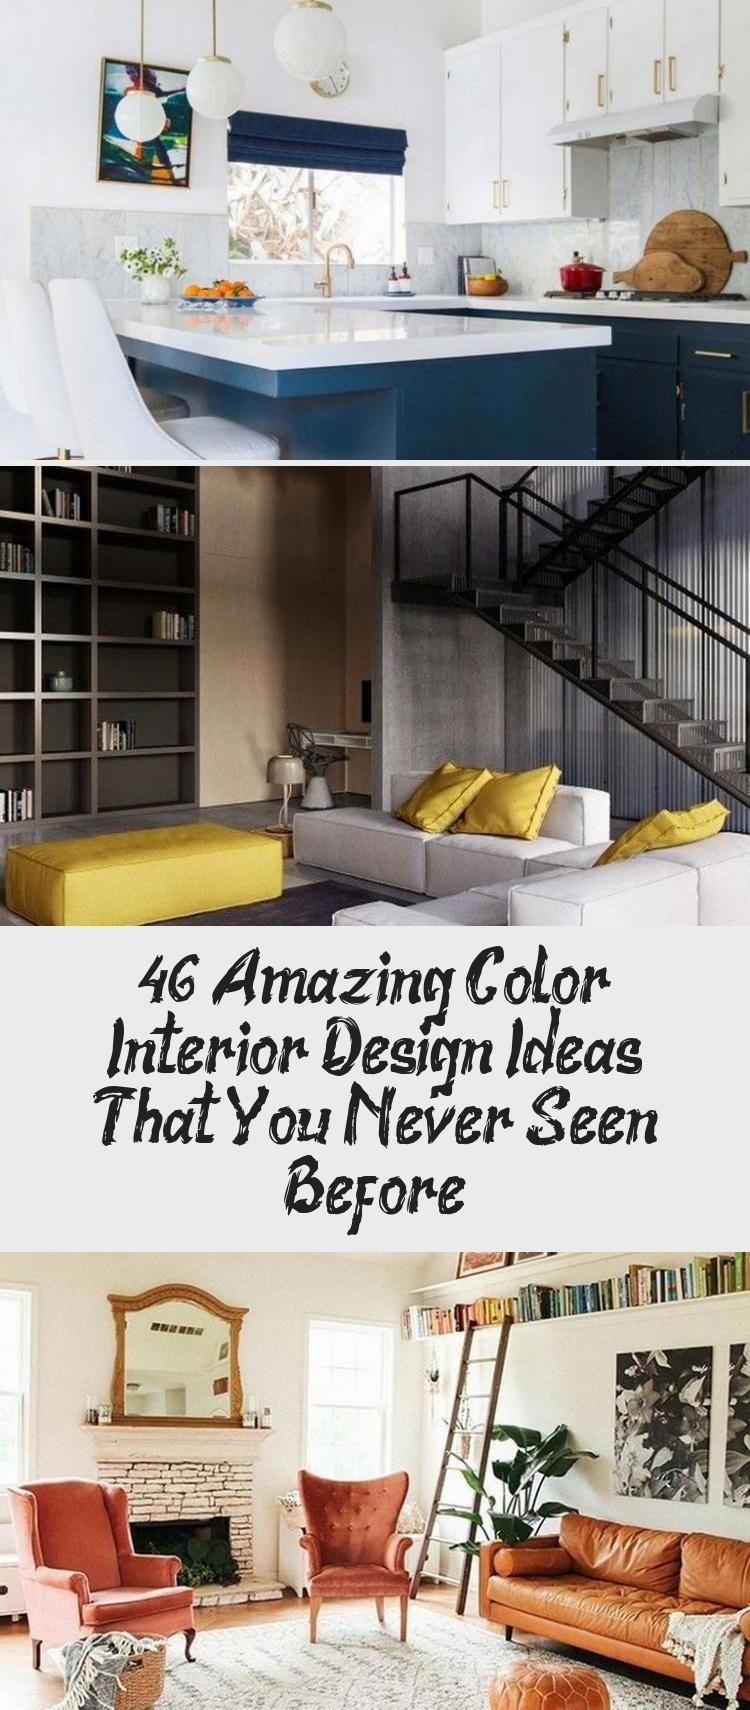 46+ Amazing Color Interior Design Ideas That You Never Seen Before #interiordesign #interiordesignideas #interiordecorating #interiordesignSketches #interiordesignDepartament #interiordesignClassic #Traditionalinteriordesign #Vintageinteriordesign